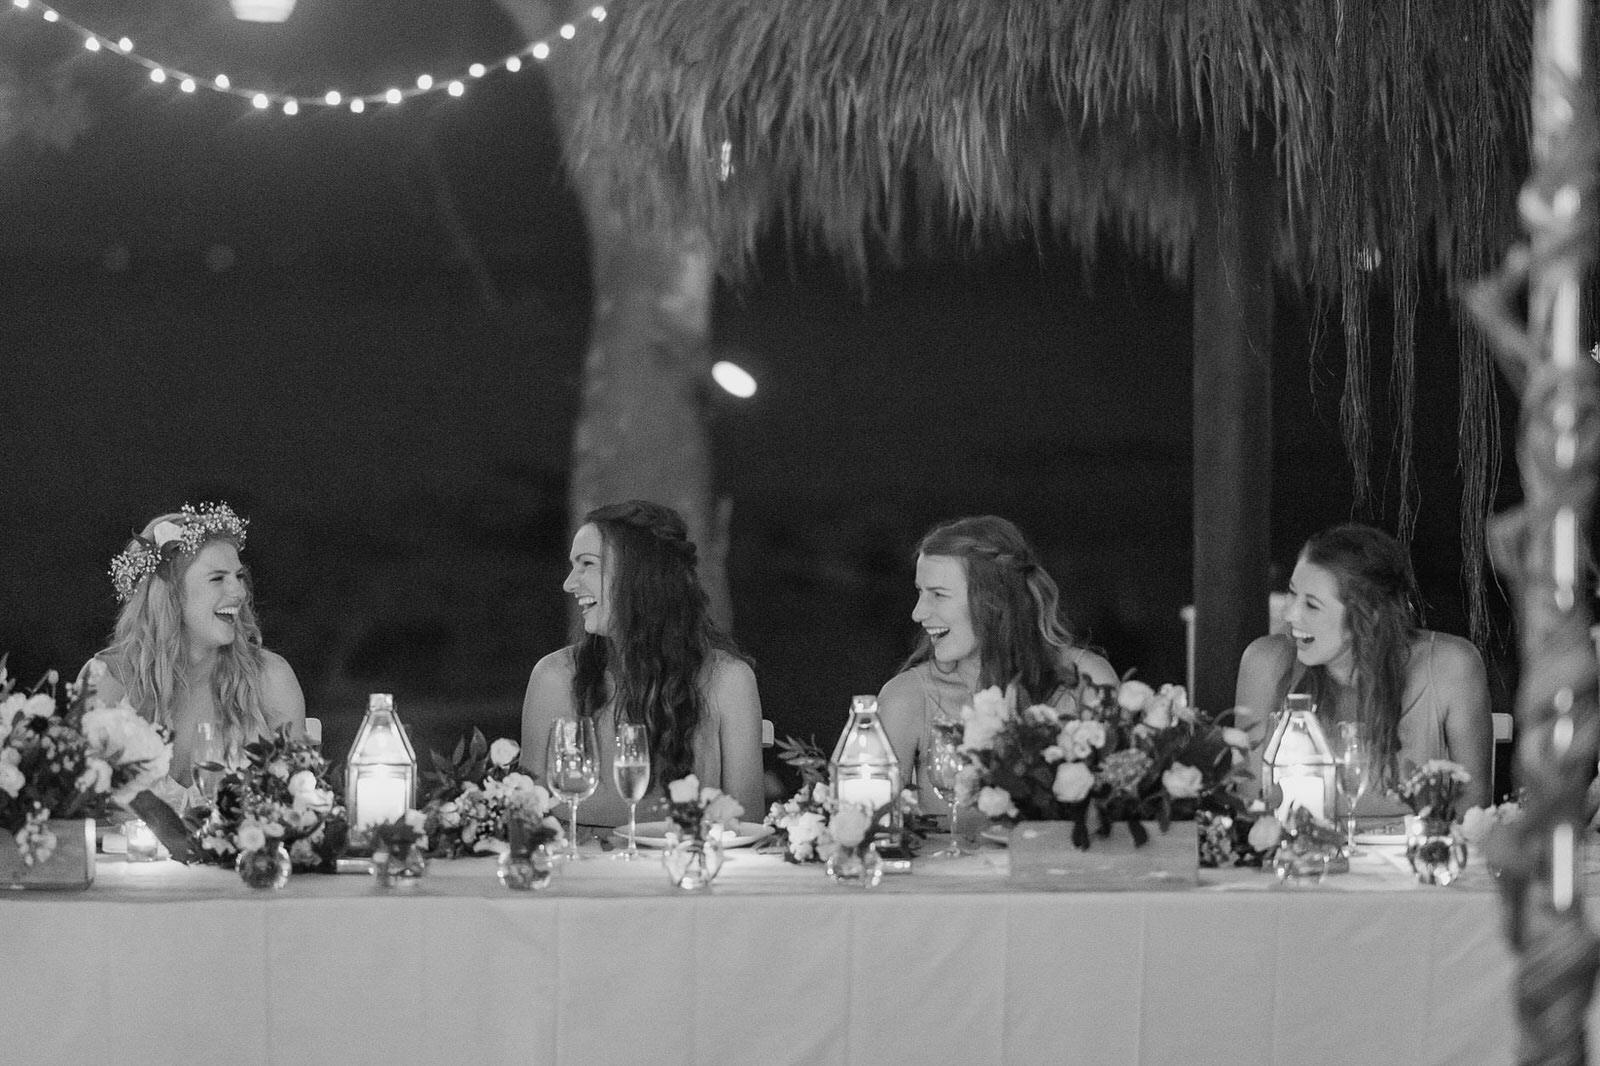 newfound-hai-tide-nusa-lembongan-bali-wedding-photographers-150